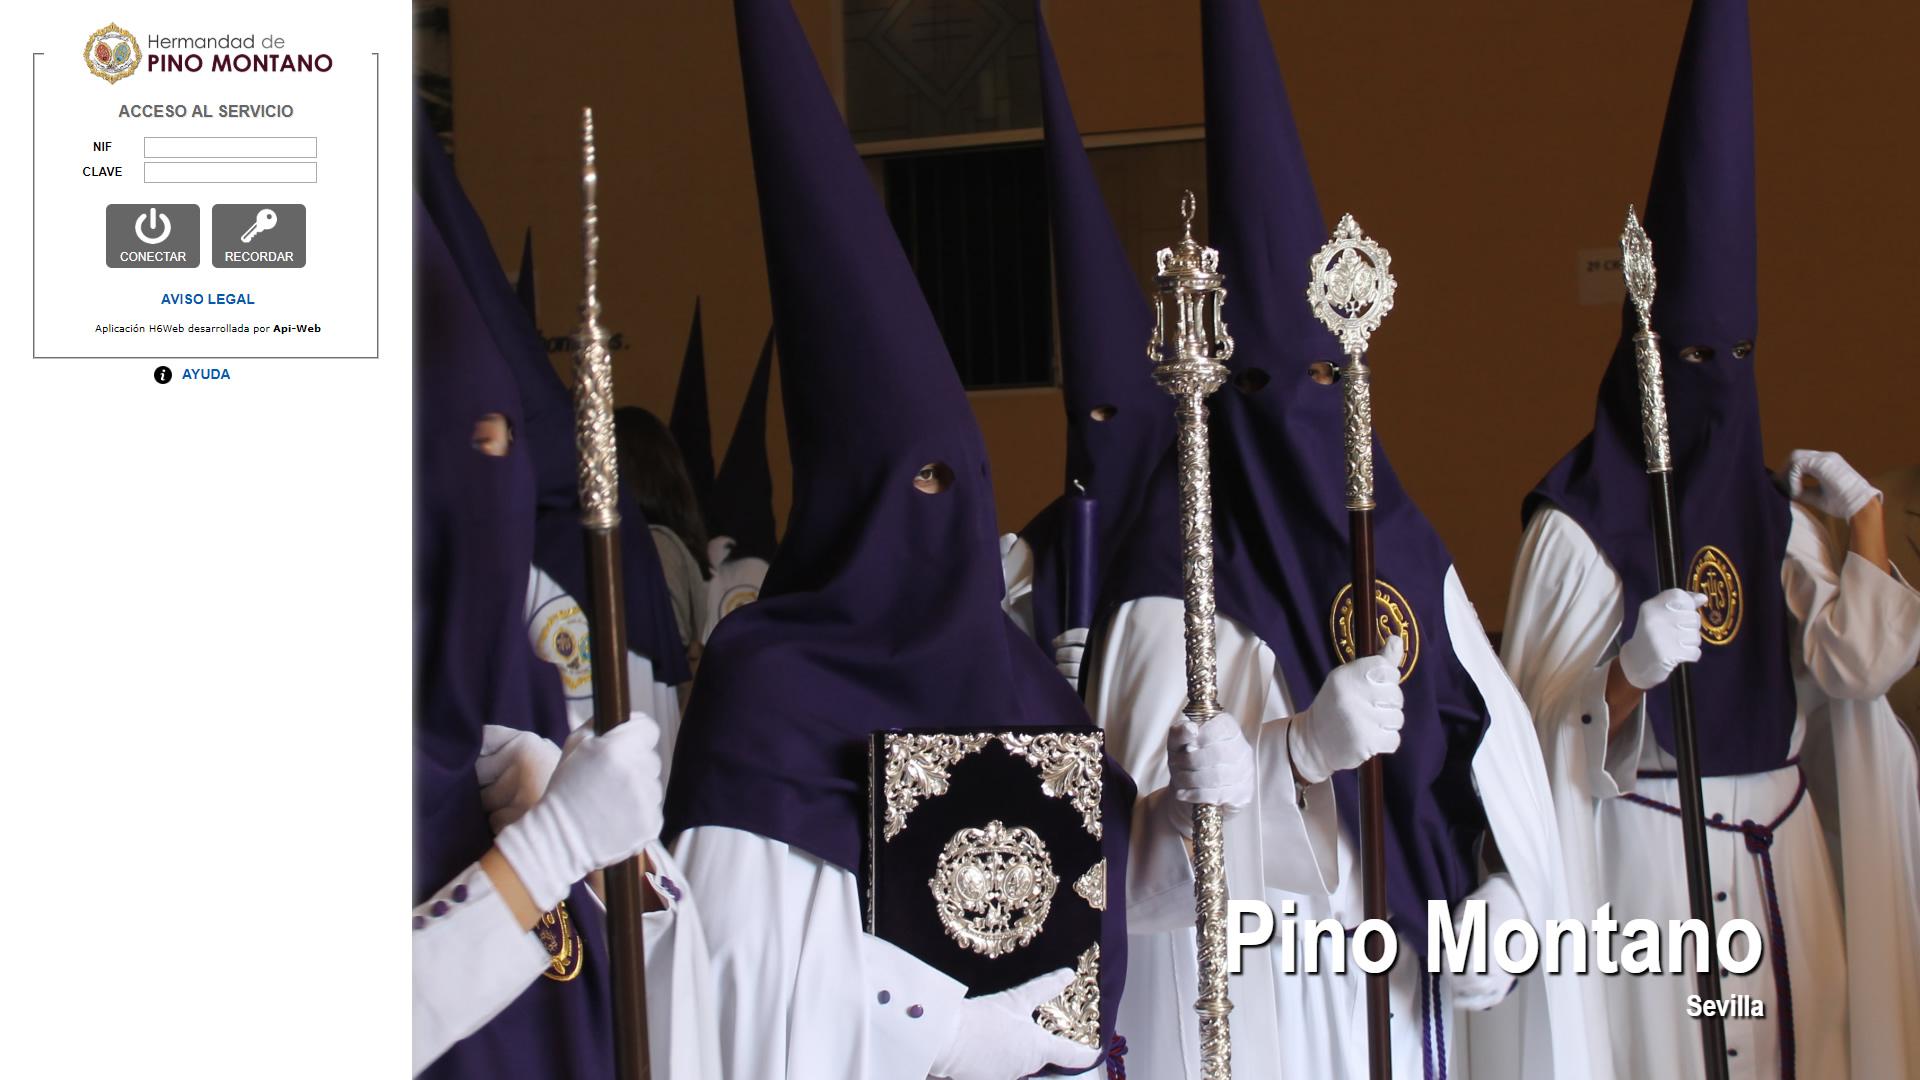 Hermandad de Pino Montano Sevilla